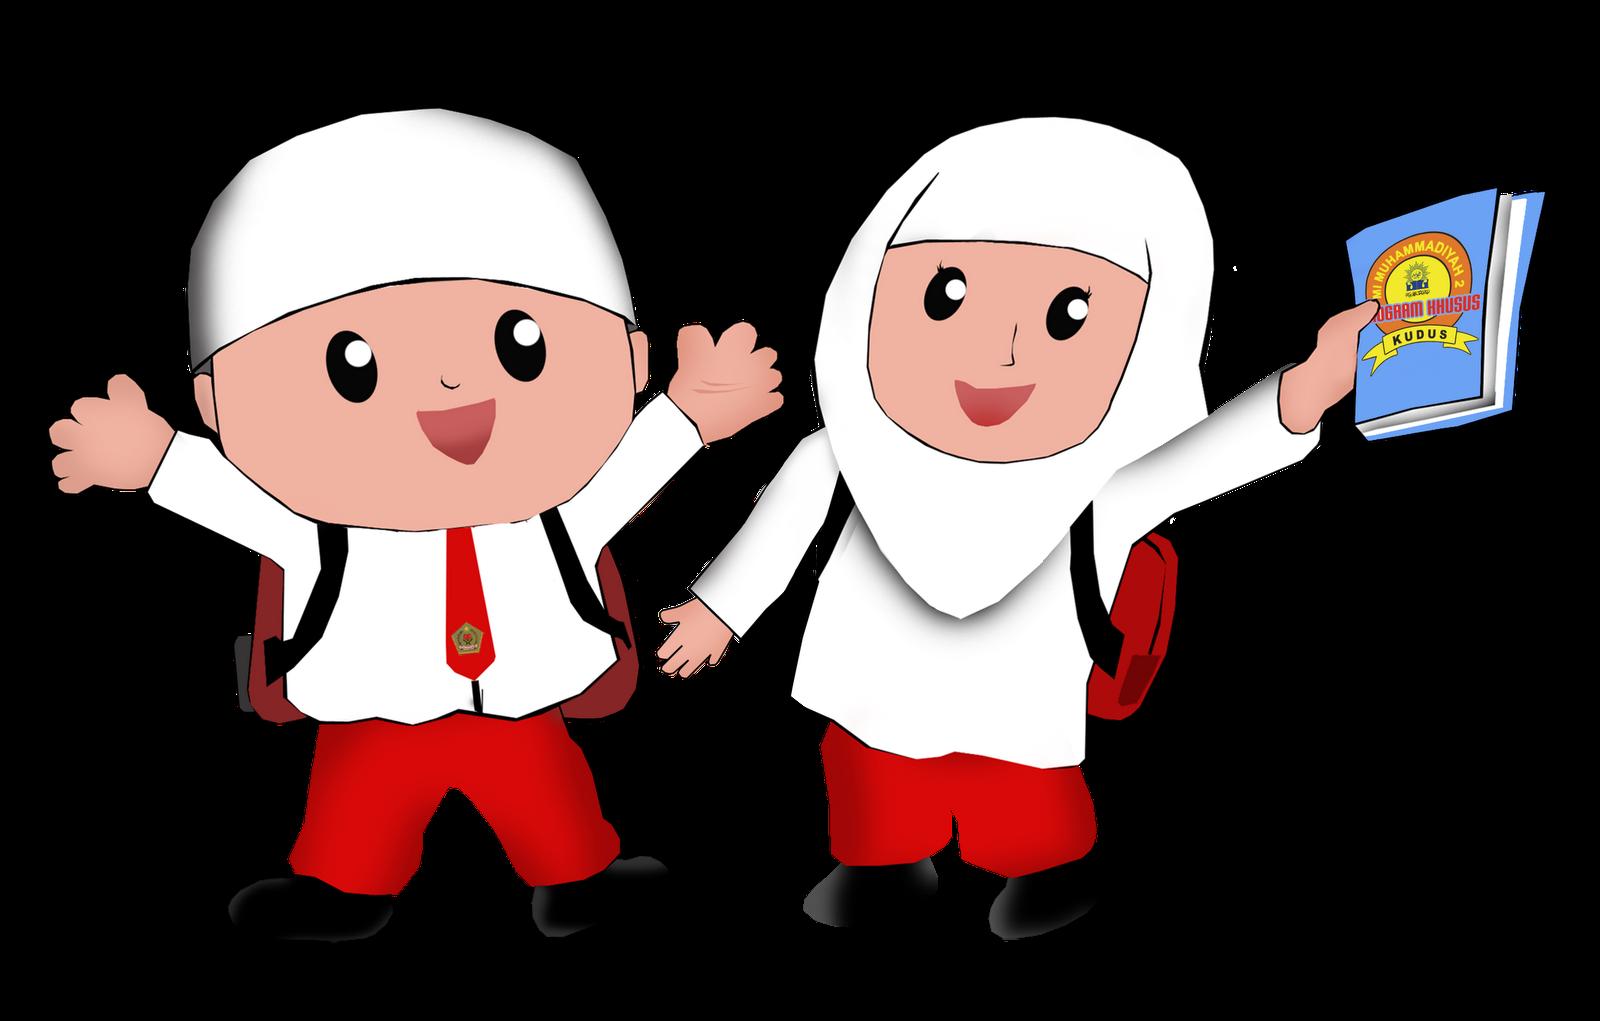 Gambar Kartun Anak Katoon Pinterest Wallpaper Islam And Muslim Kartun Gambar Lucu Sekolah Lucu